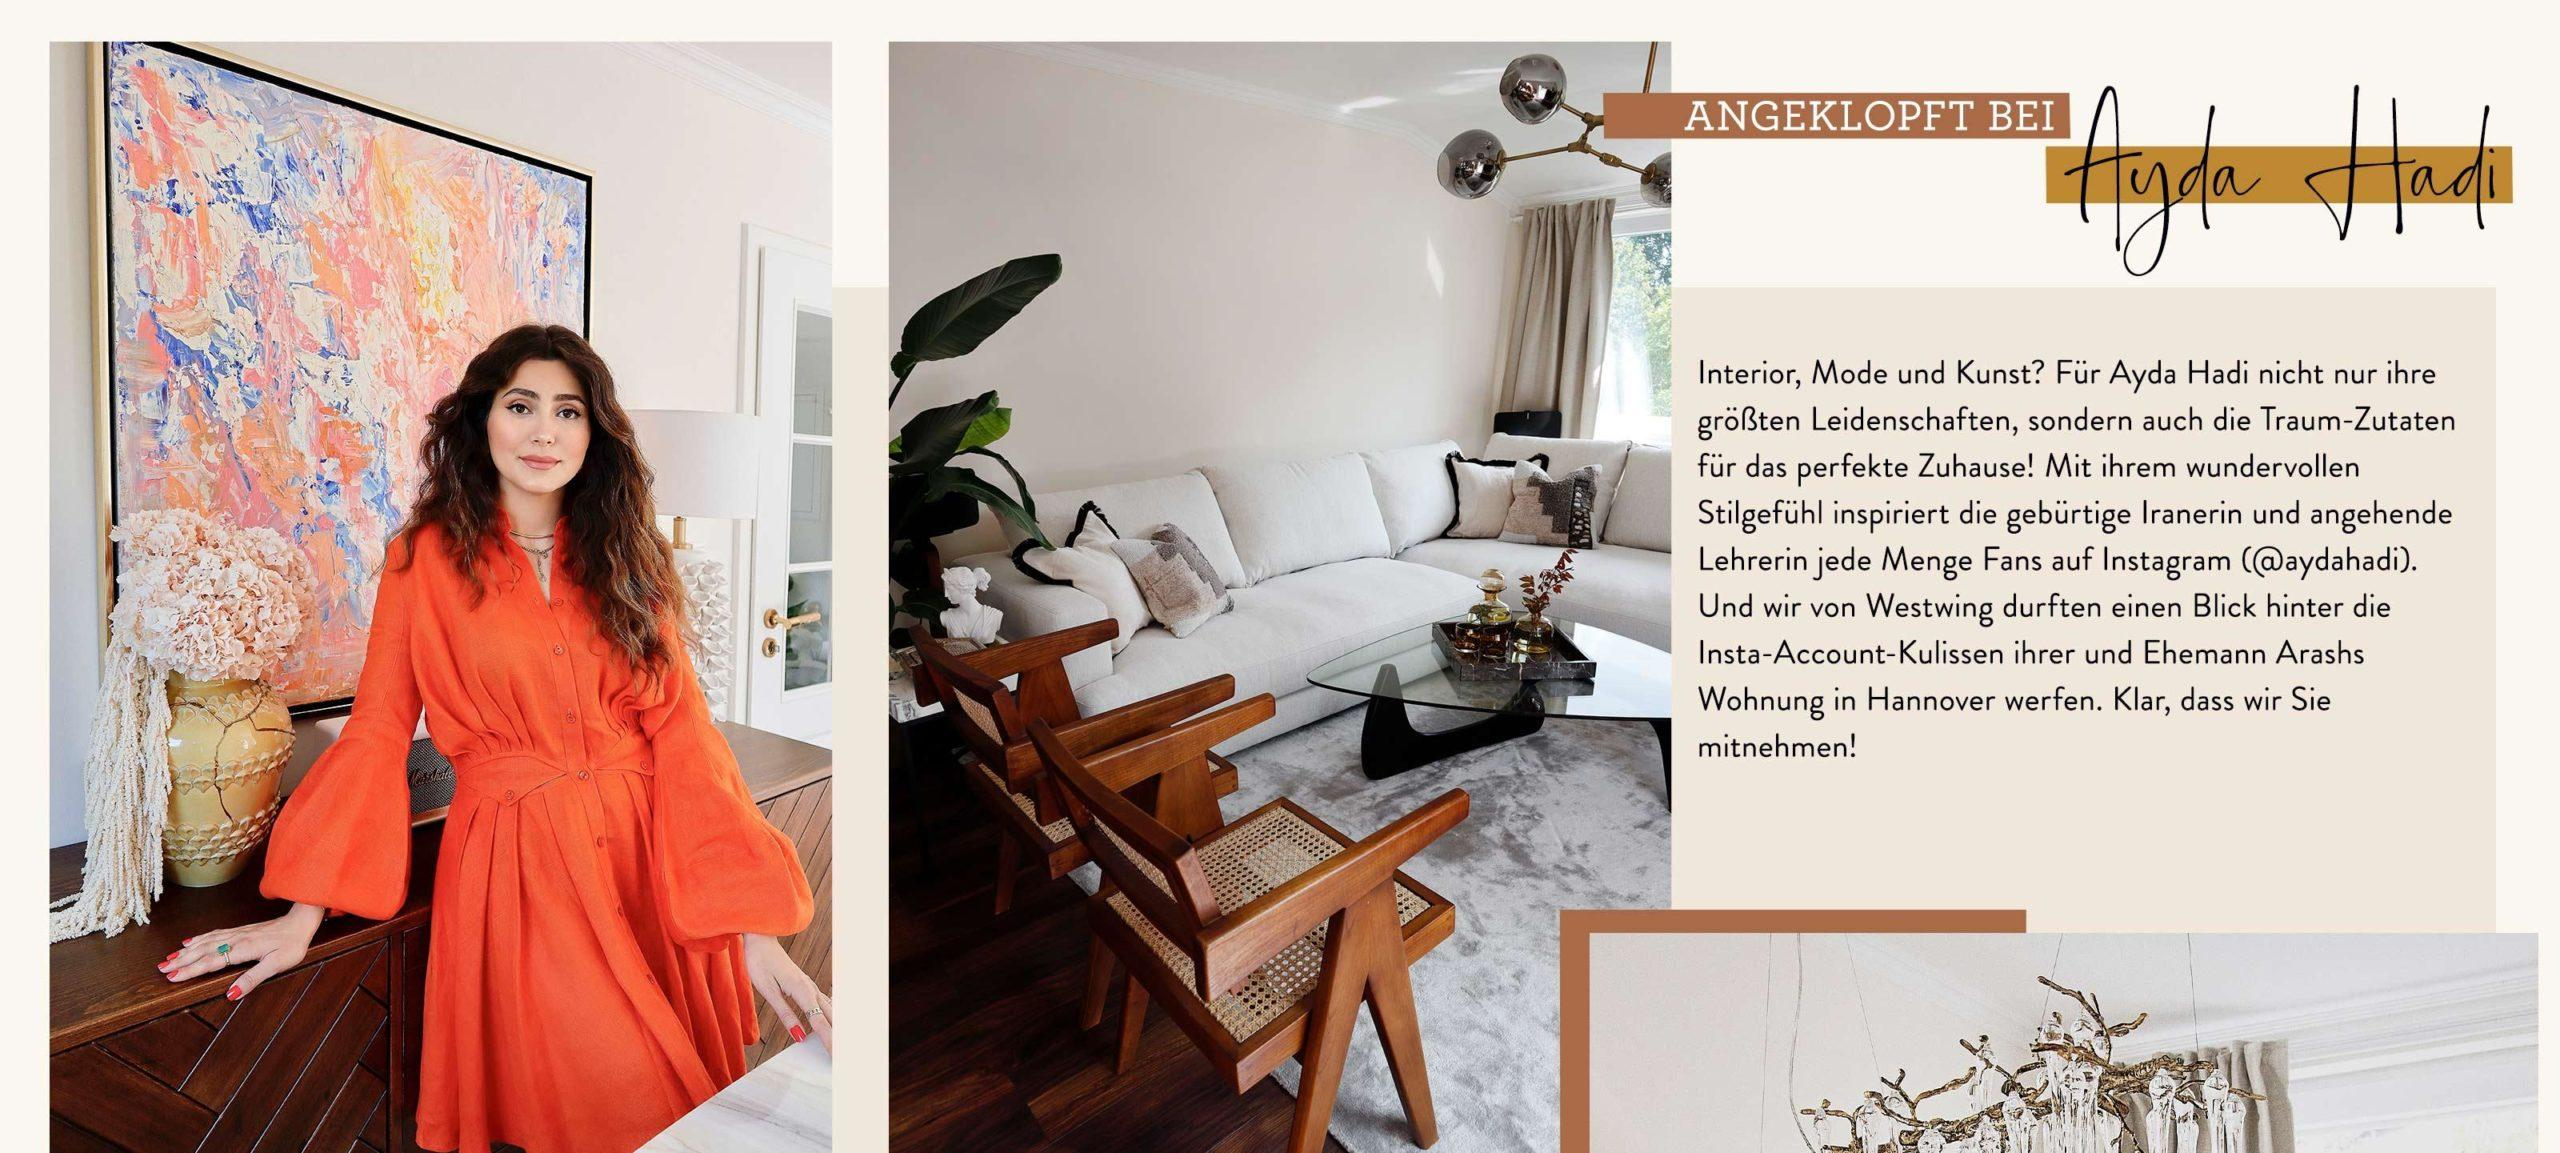 Ayda Hadi Info Text Wohnzimmer Sofa